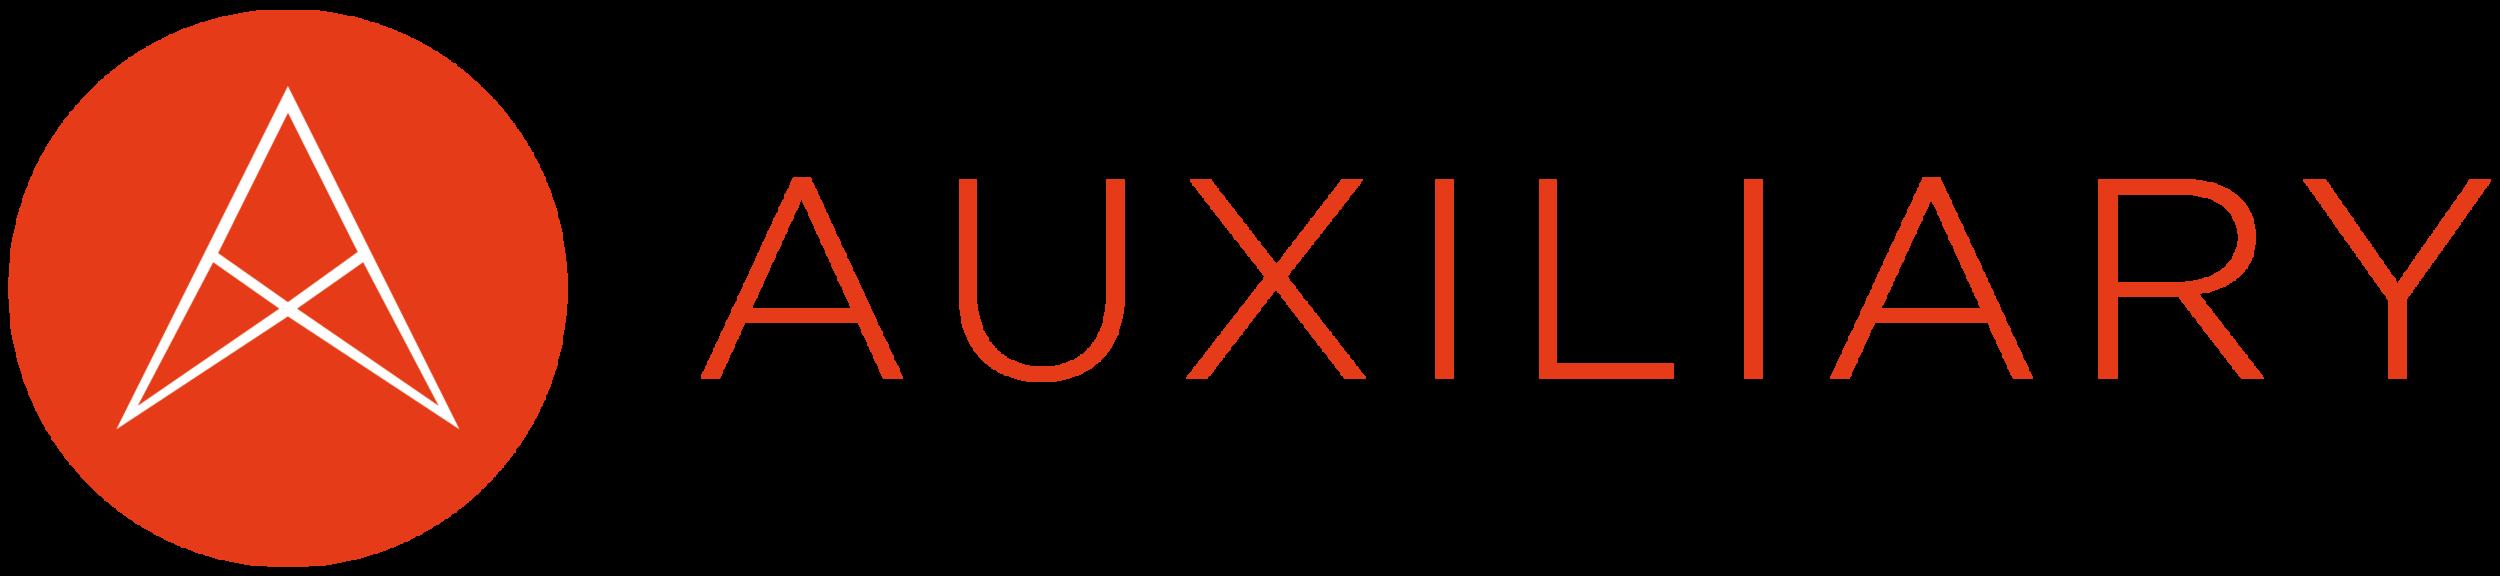 AUXILIARY Design School